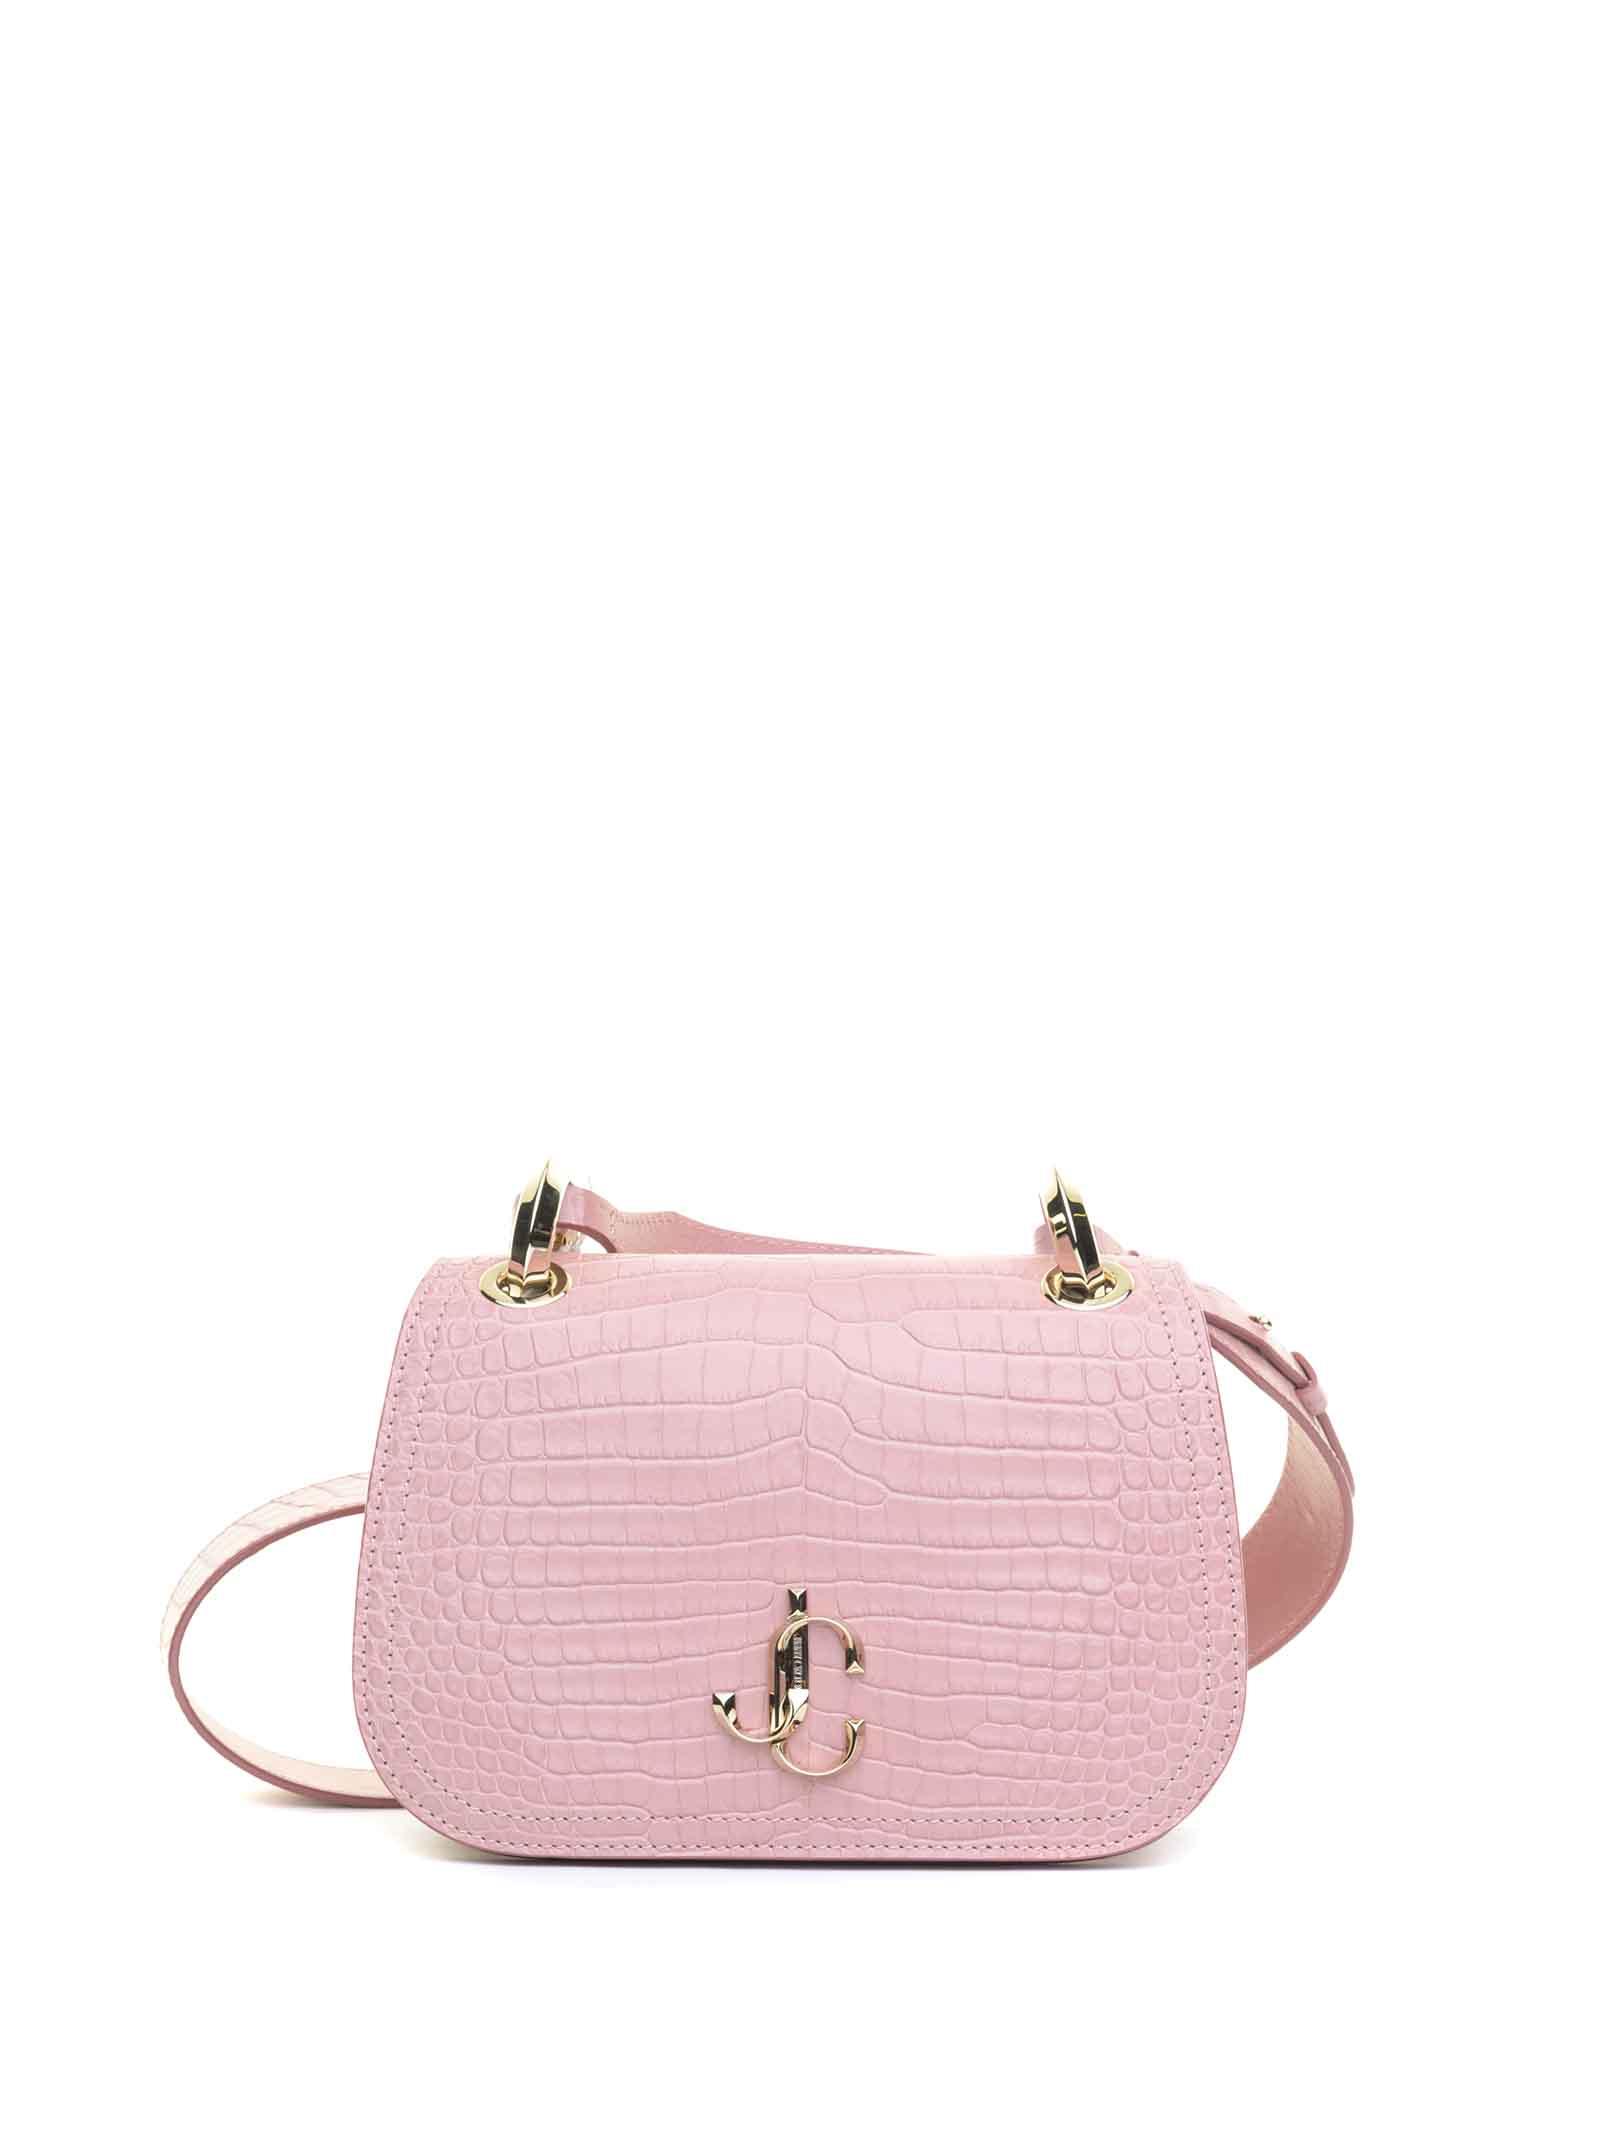 Jimmy Choo Varenne Crossbody Bag In Blush